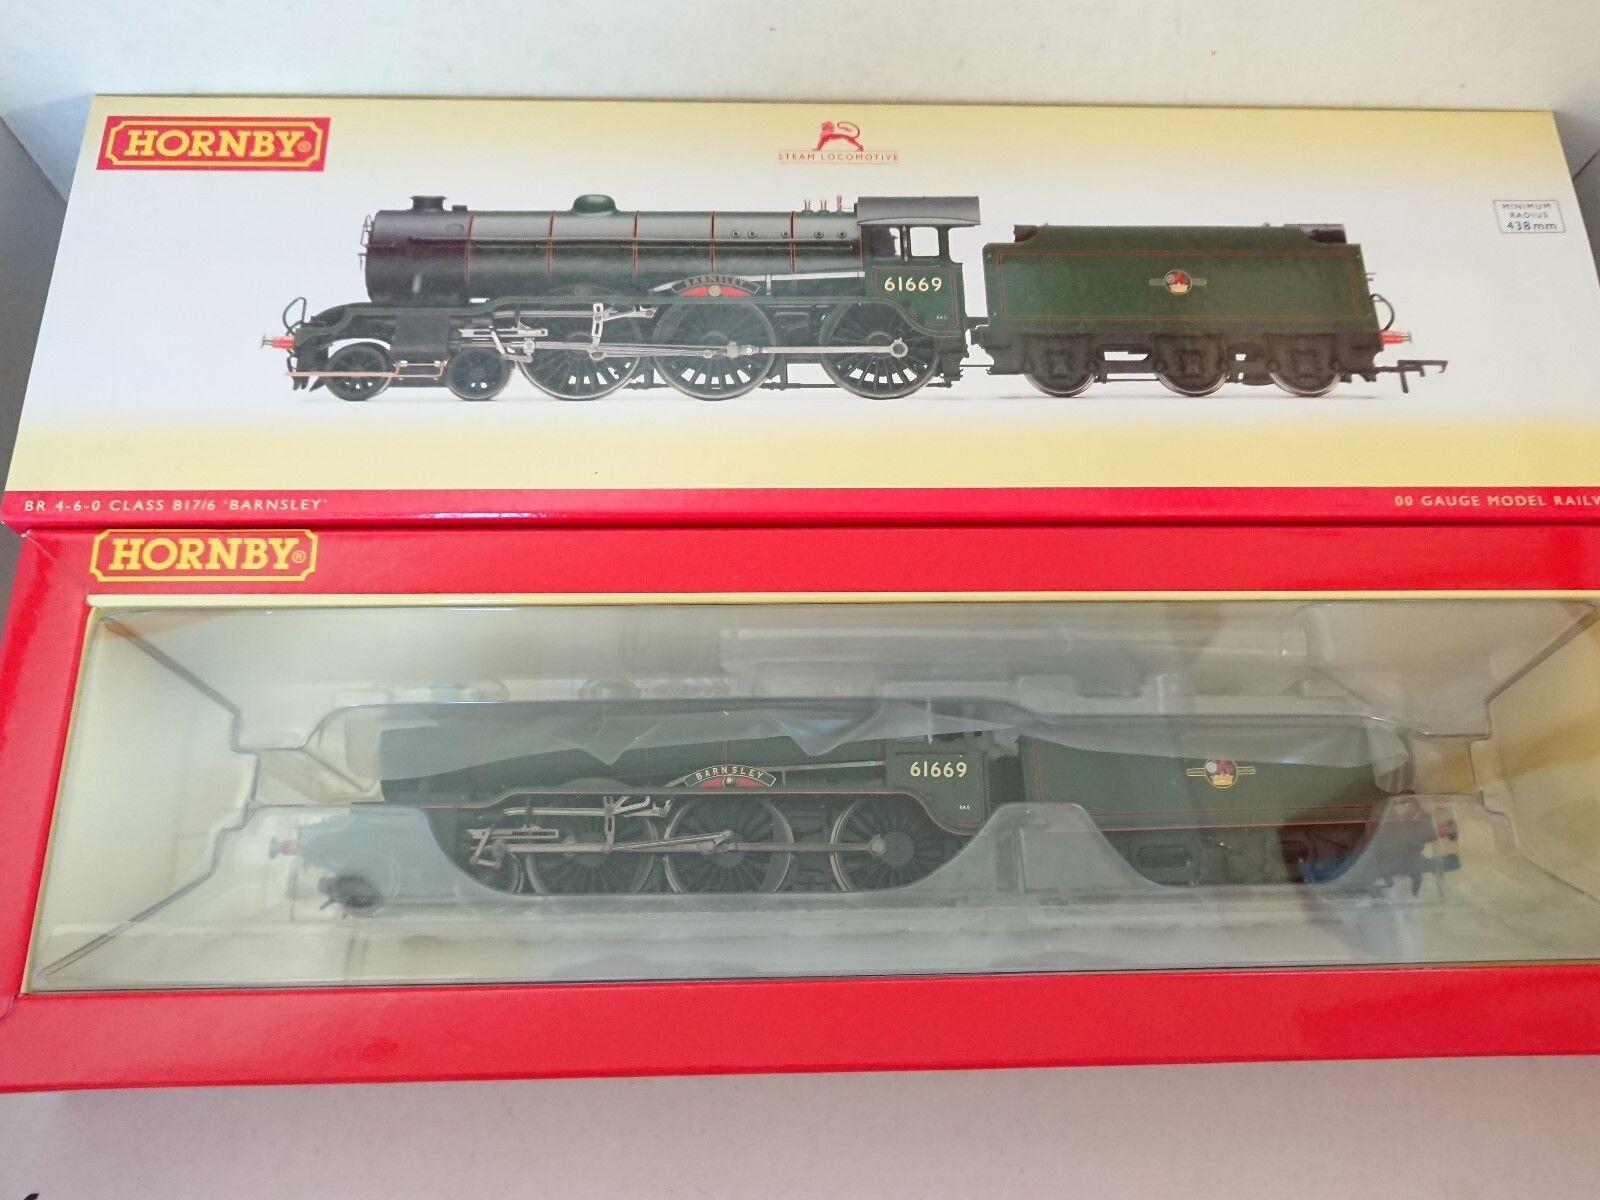 Hornby R3003 BR 4-6-0 Class B17 6  BARNSLEY  No. 61669 DCC Ready NEW